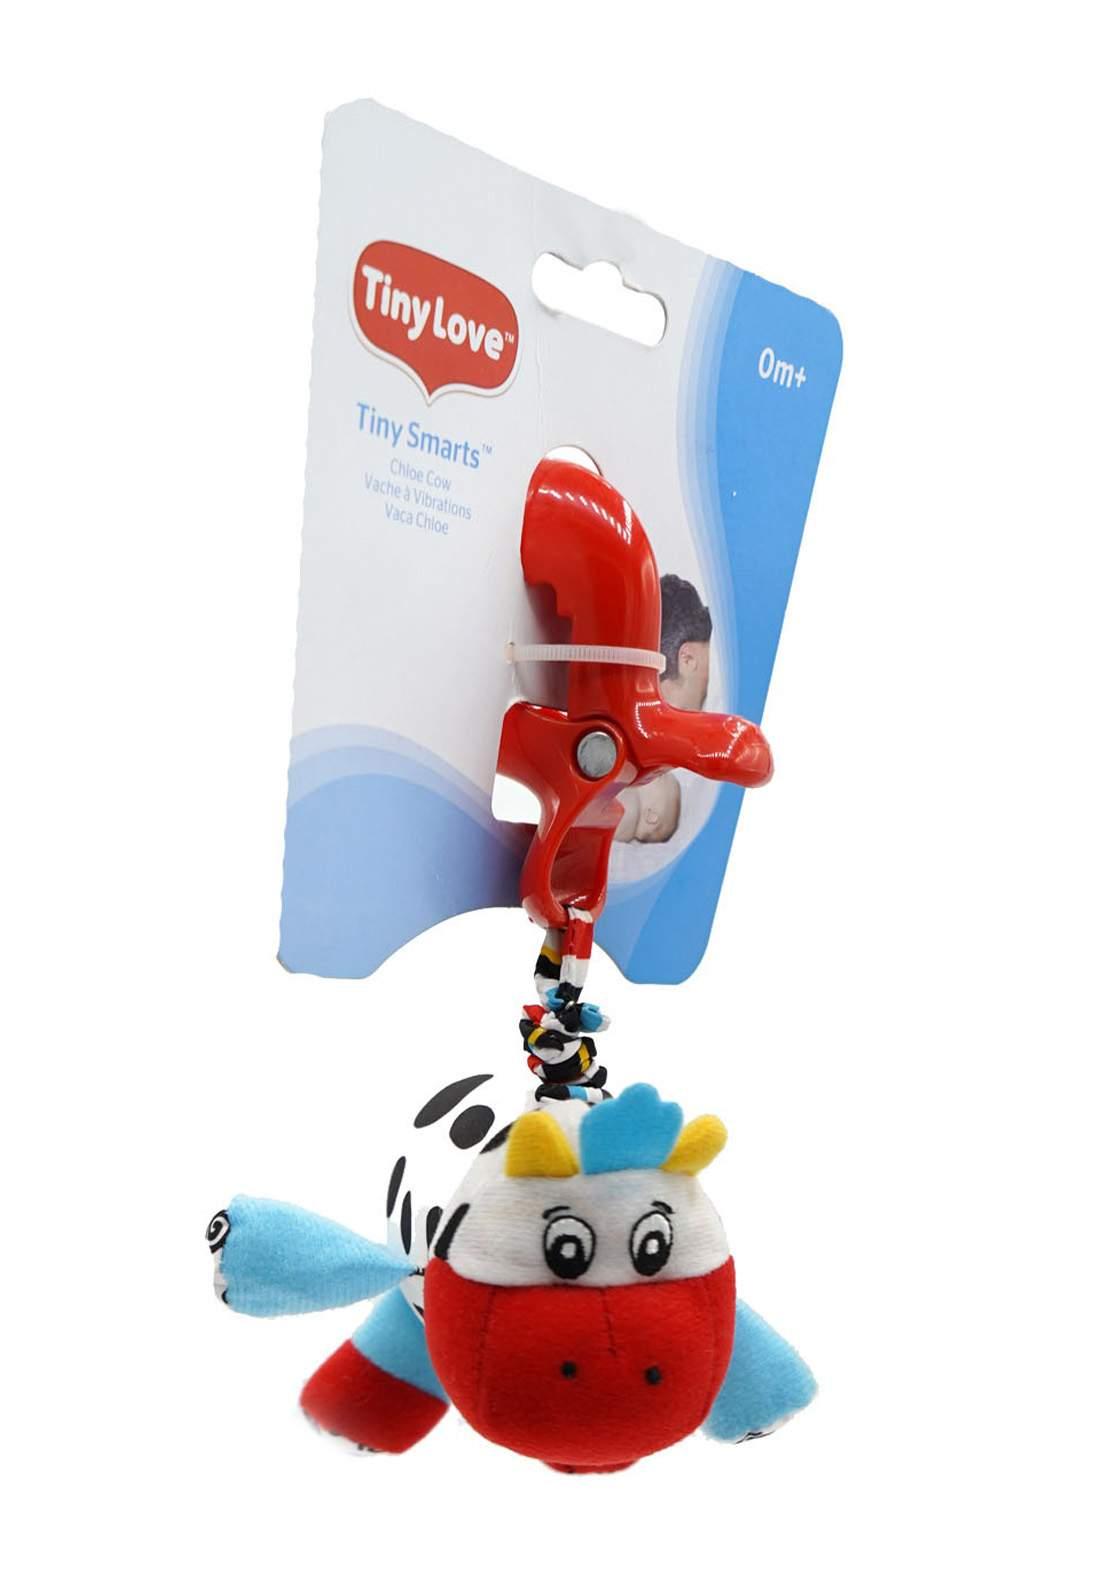 Tiny Love Smarts Clip on Toy لعبة للأطفال